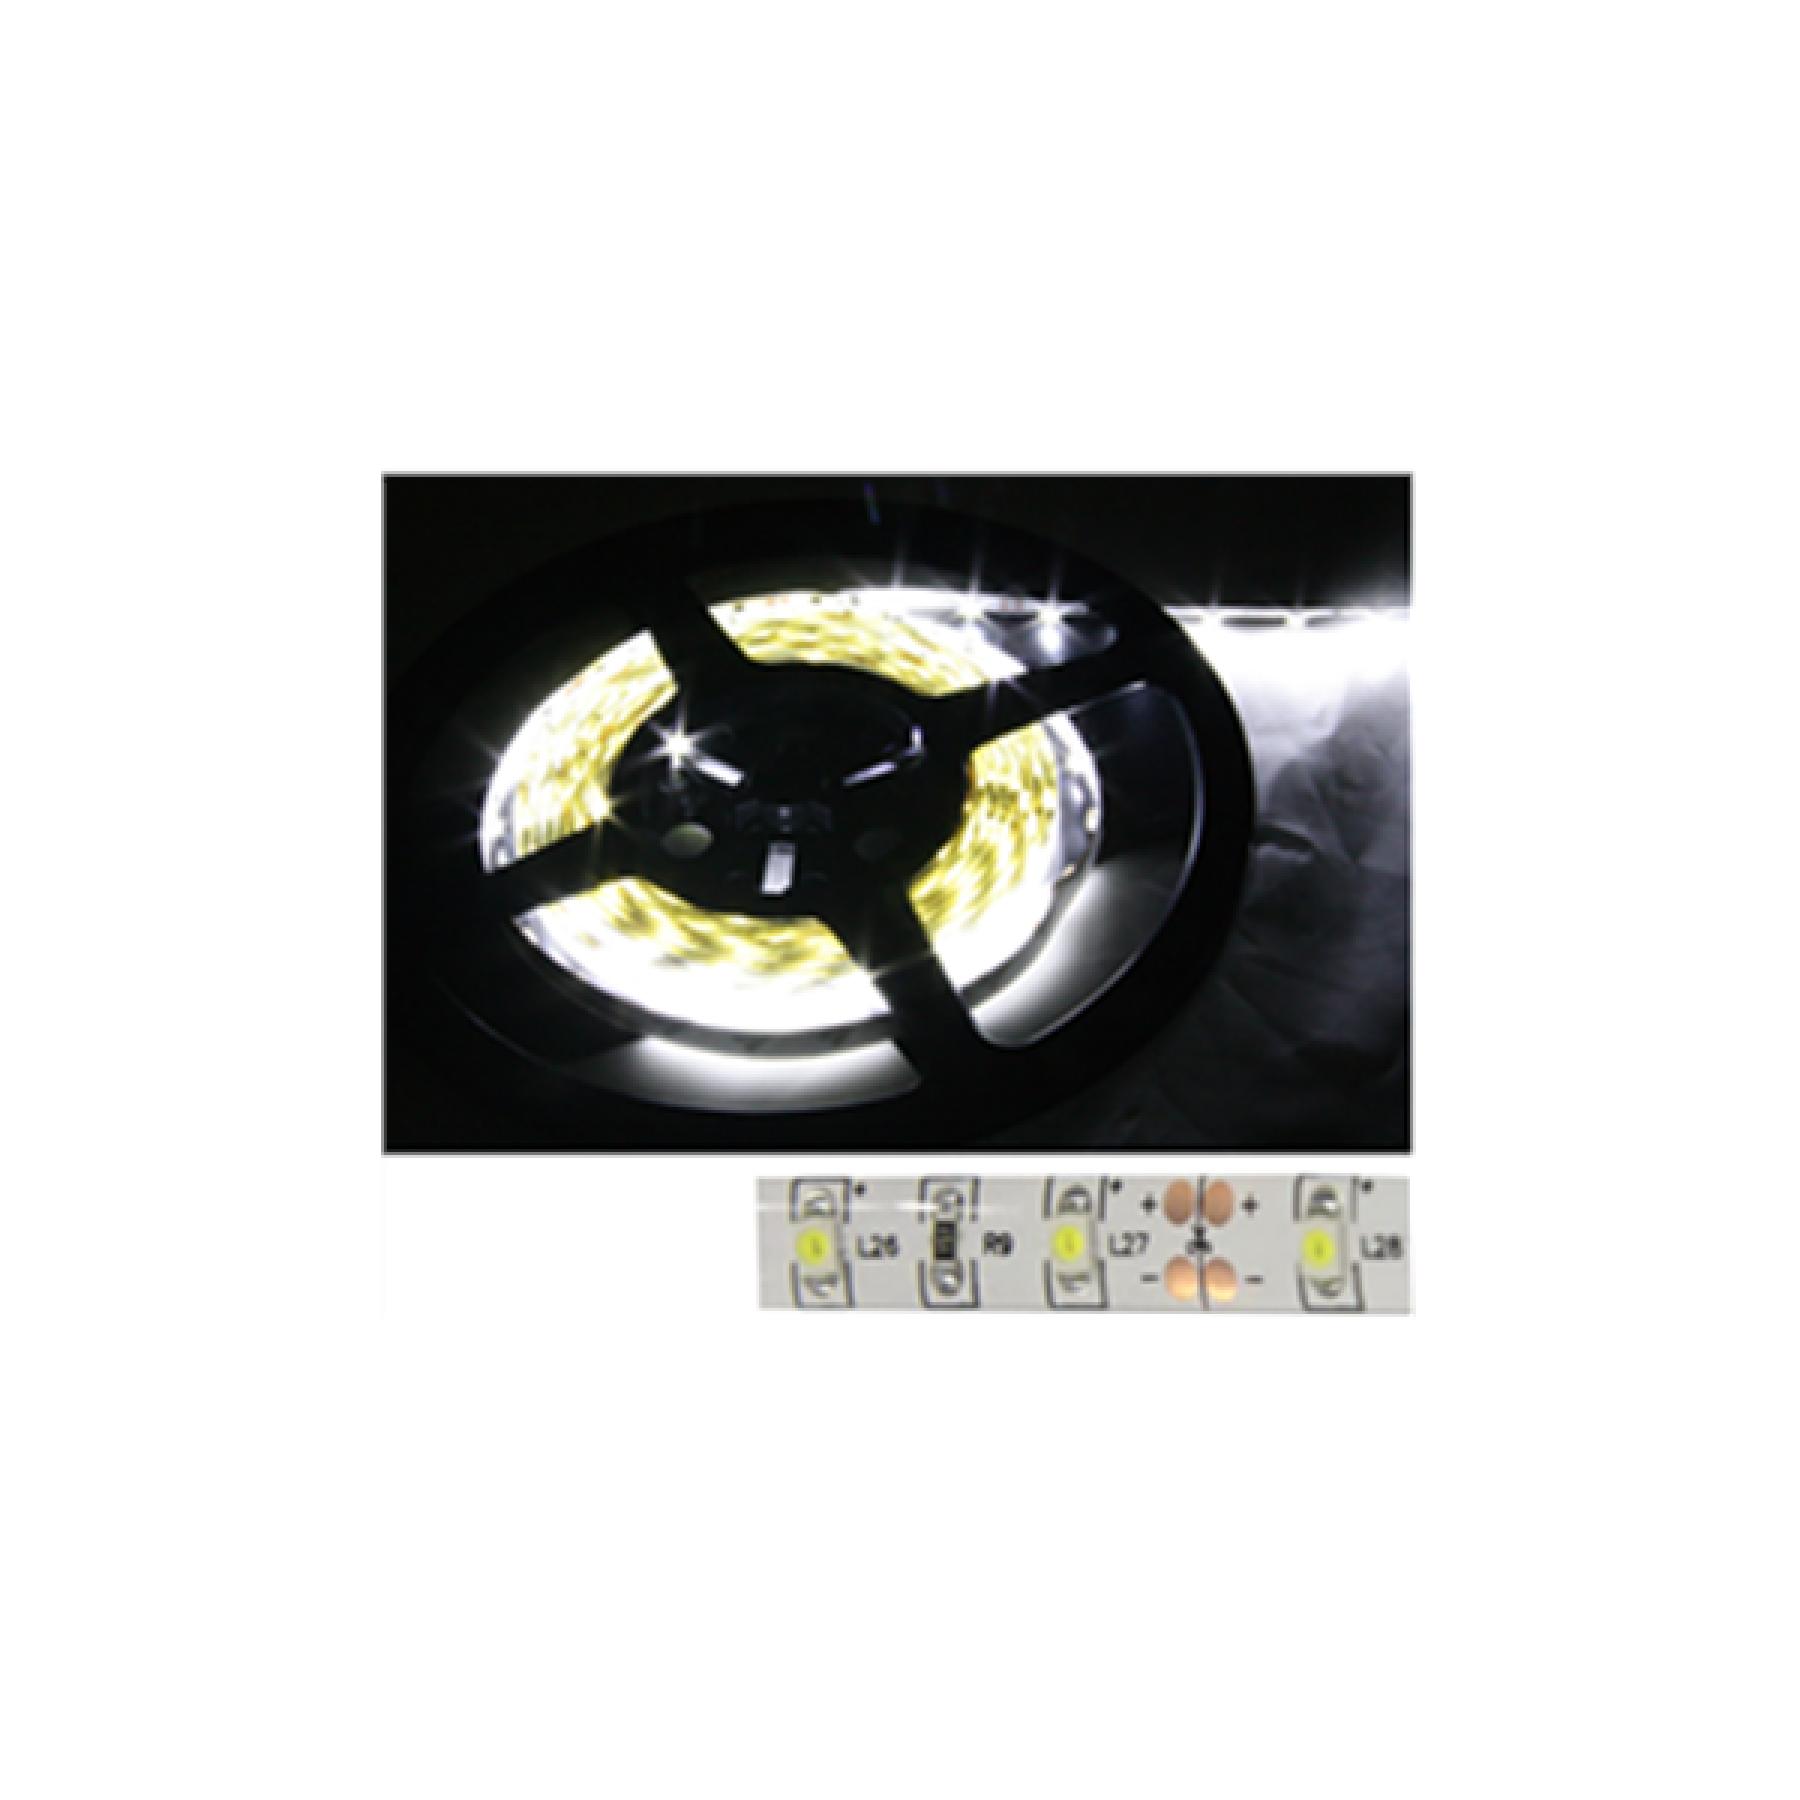 LED strip 4,8W 60LEDs/m Warm Wit 5m 24V